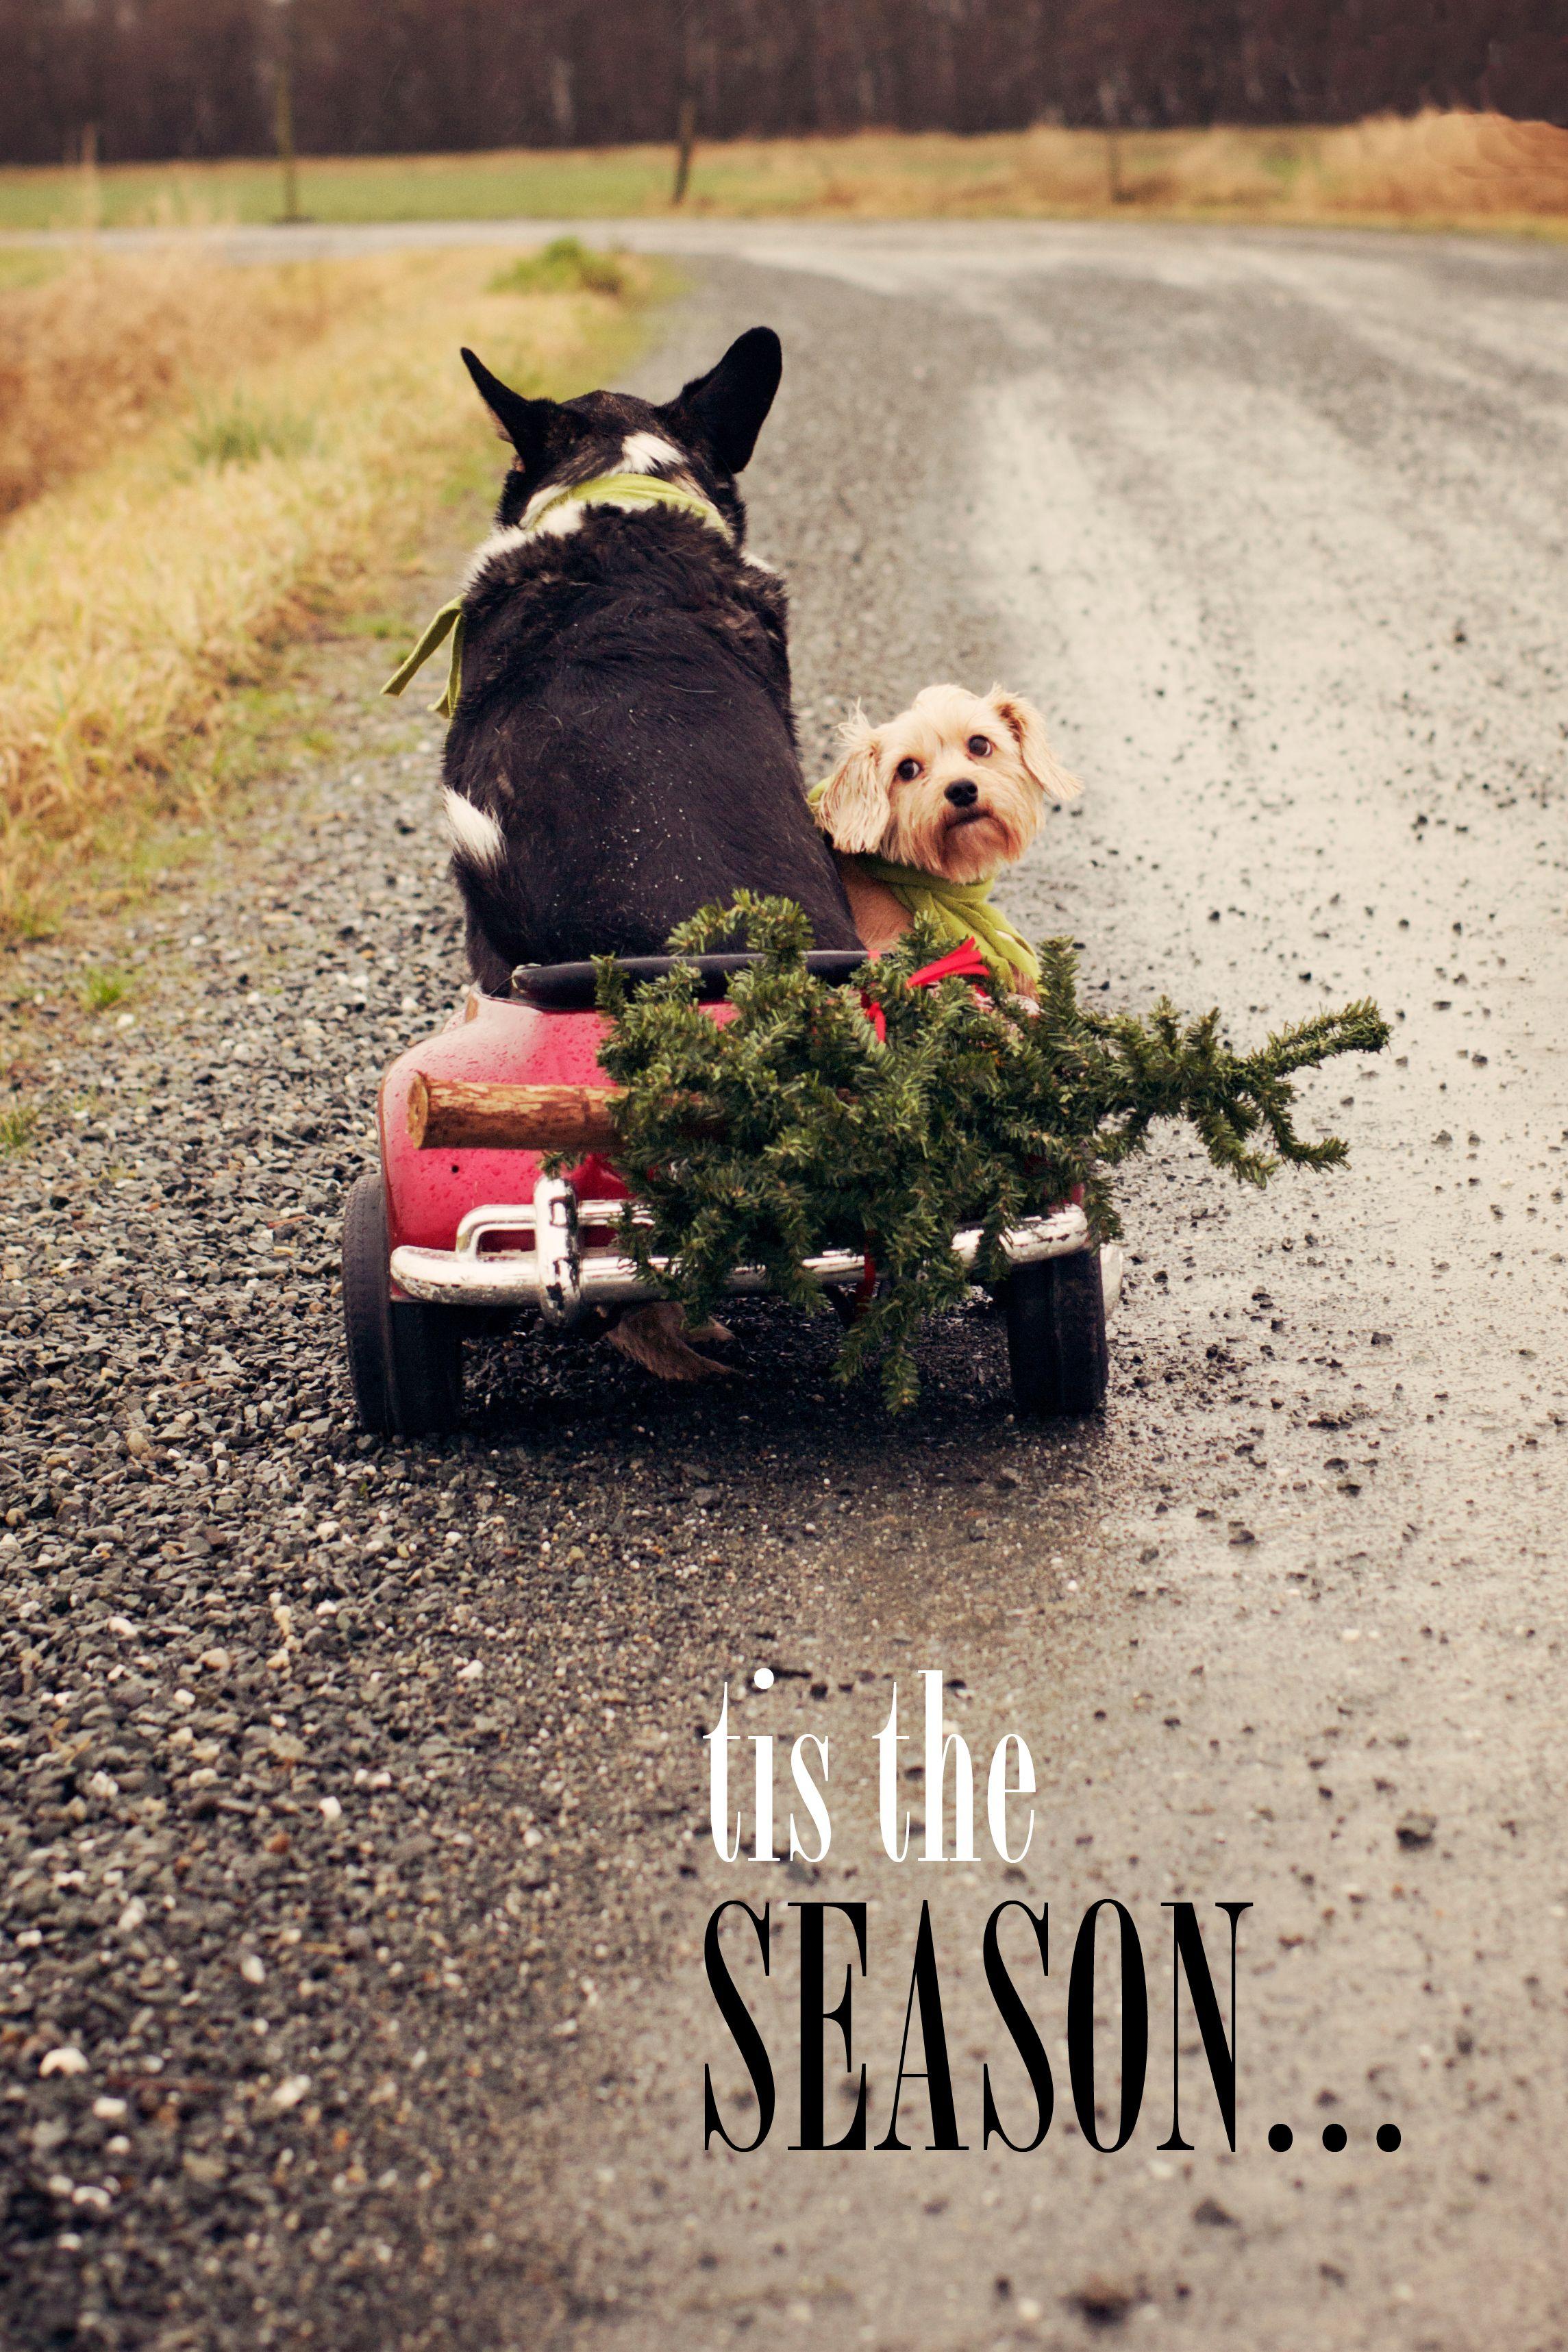 my dog card 2012 #dog #Christmascard